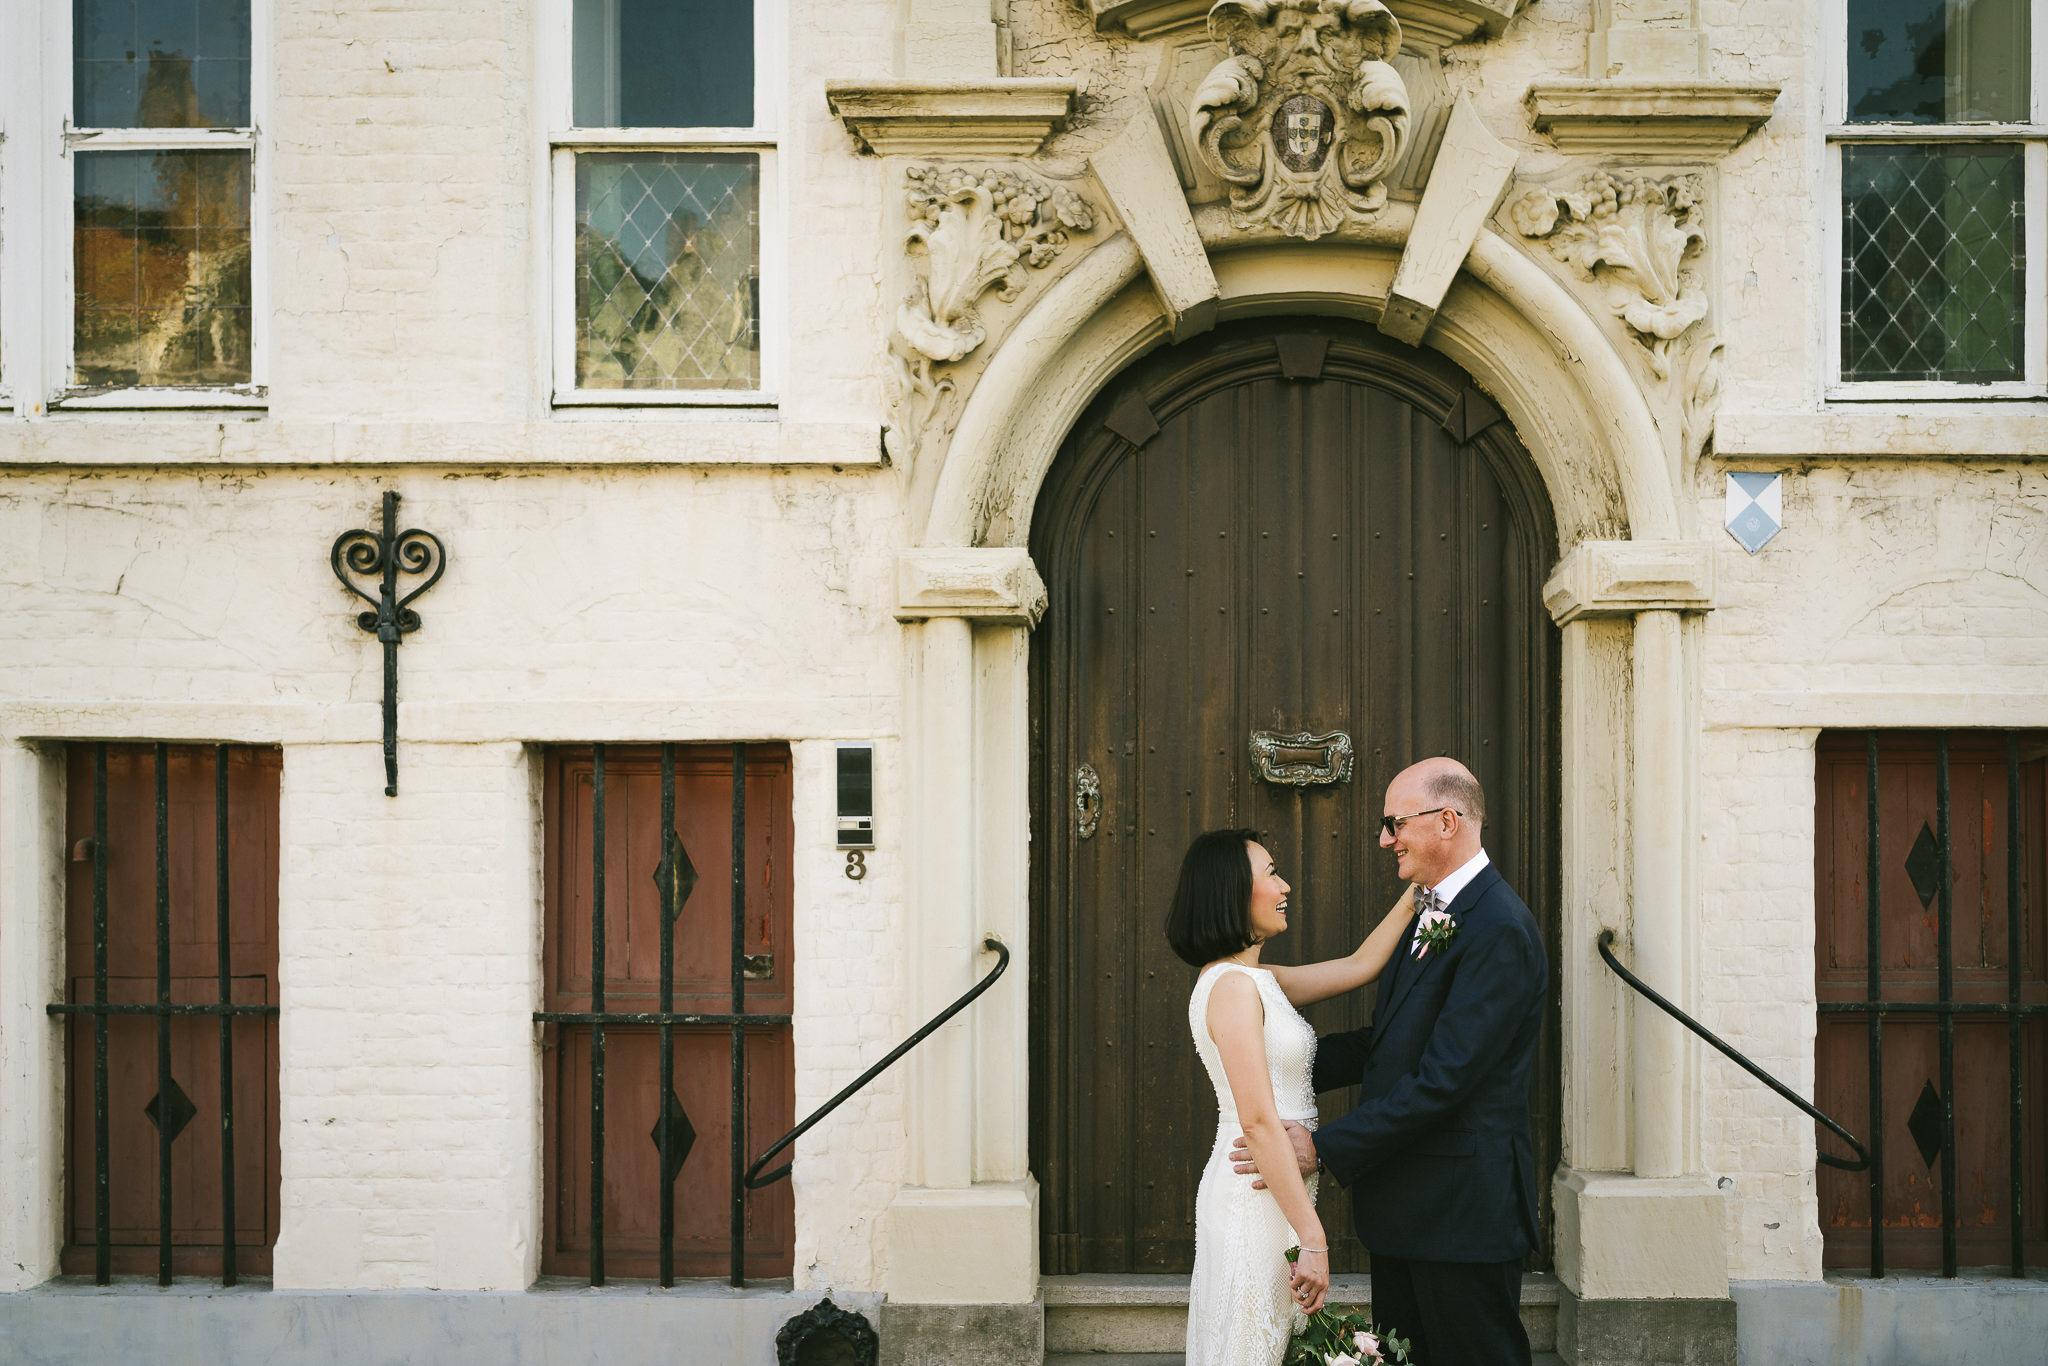 Wedding-Dona&Chris-10102018-small-223.jpg